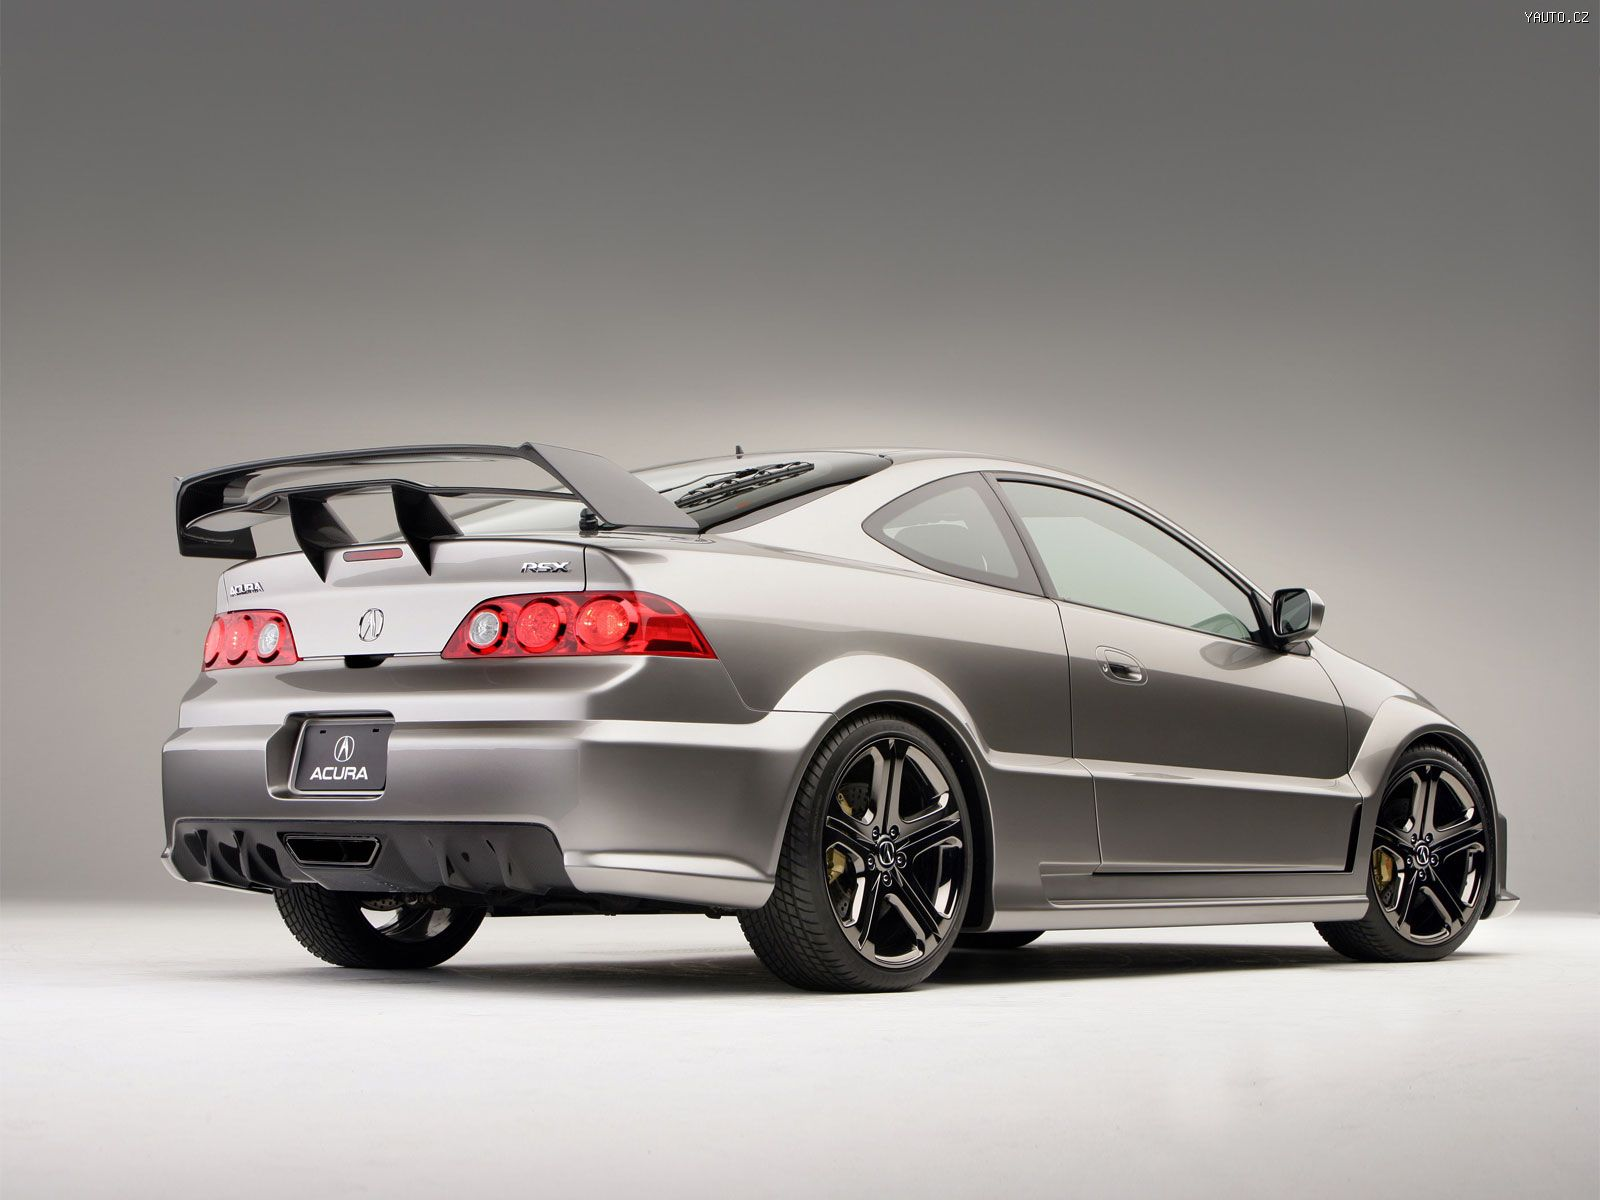 Acura_Acura_RSX_A_Spec_Concept_1.jpg